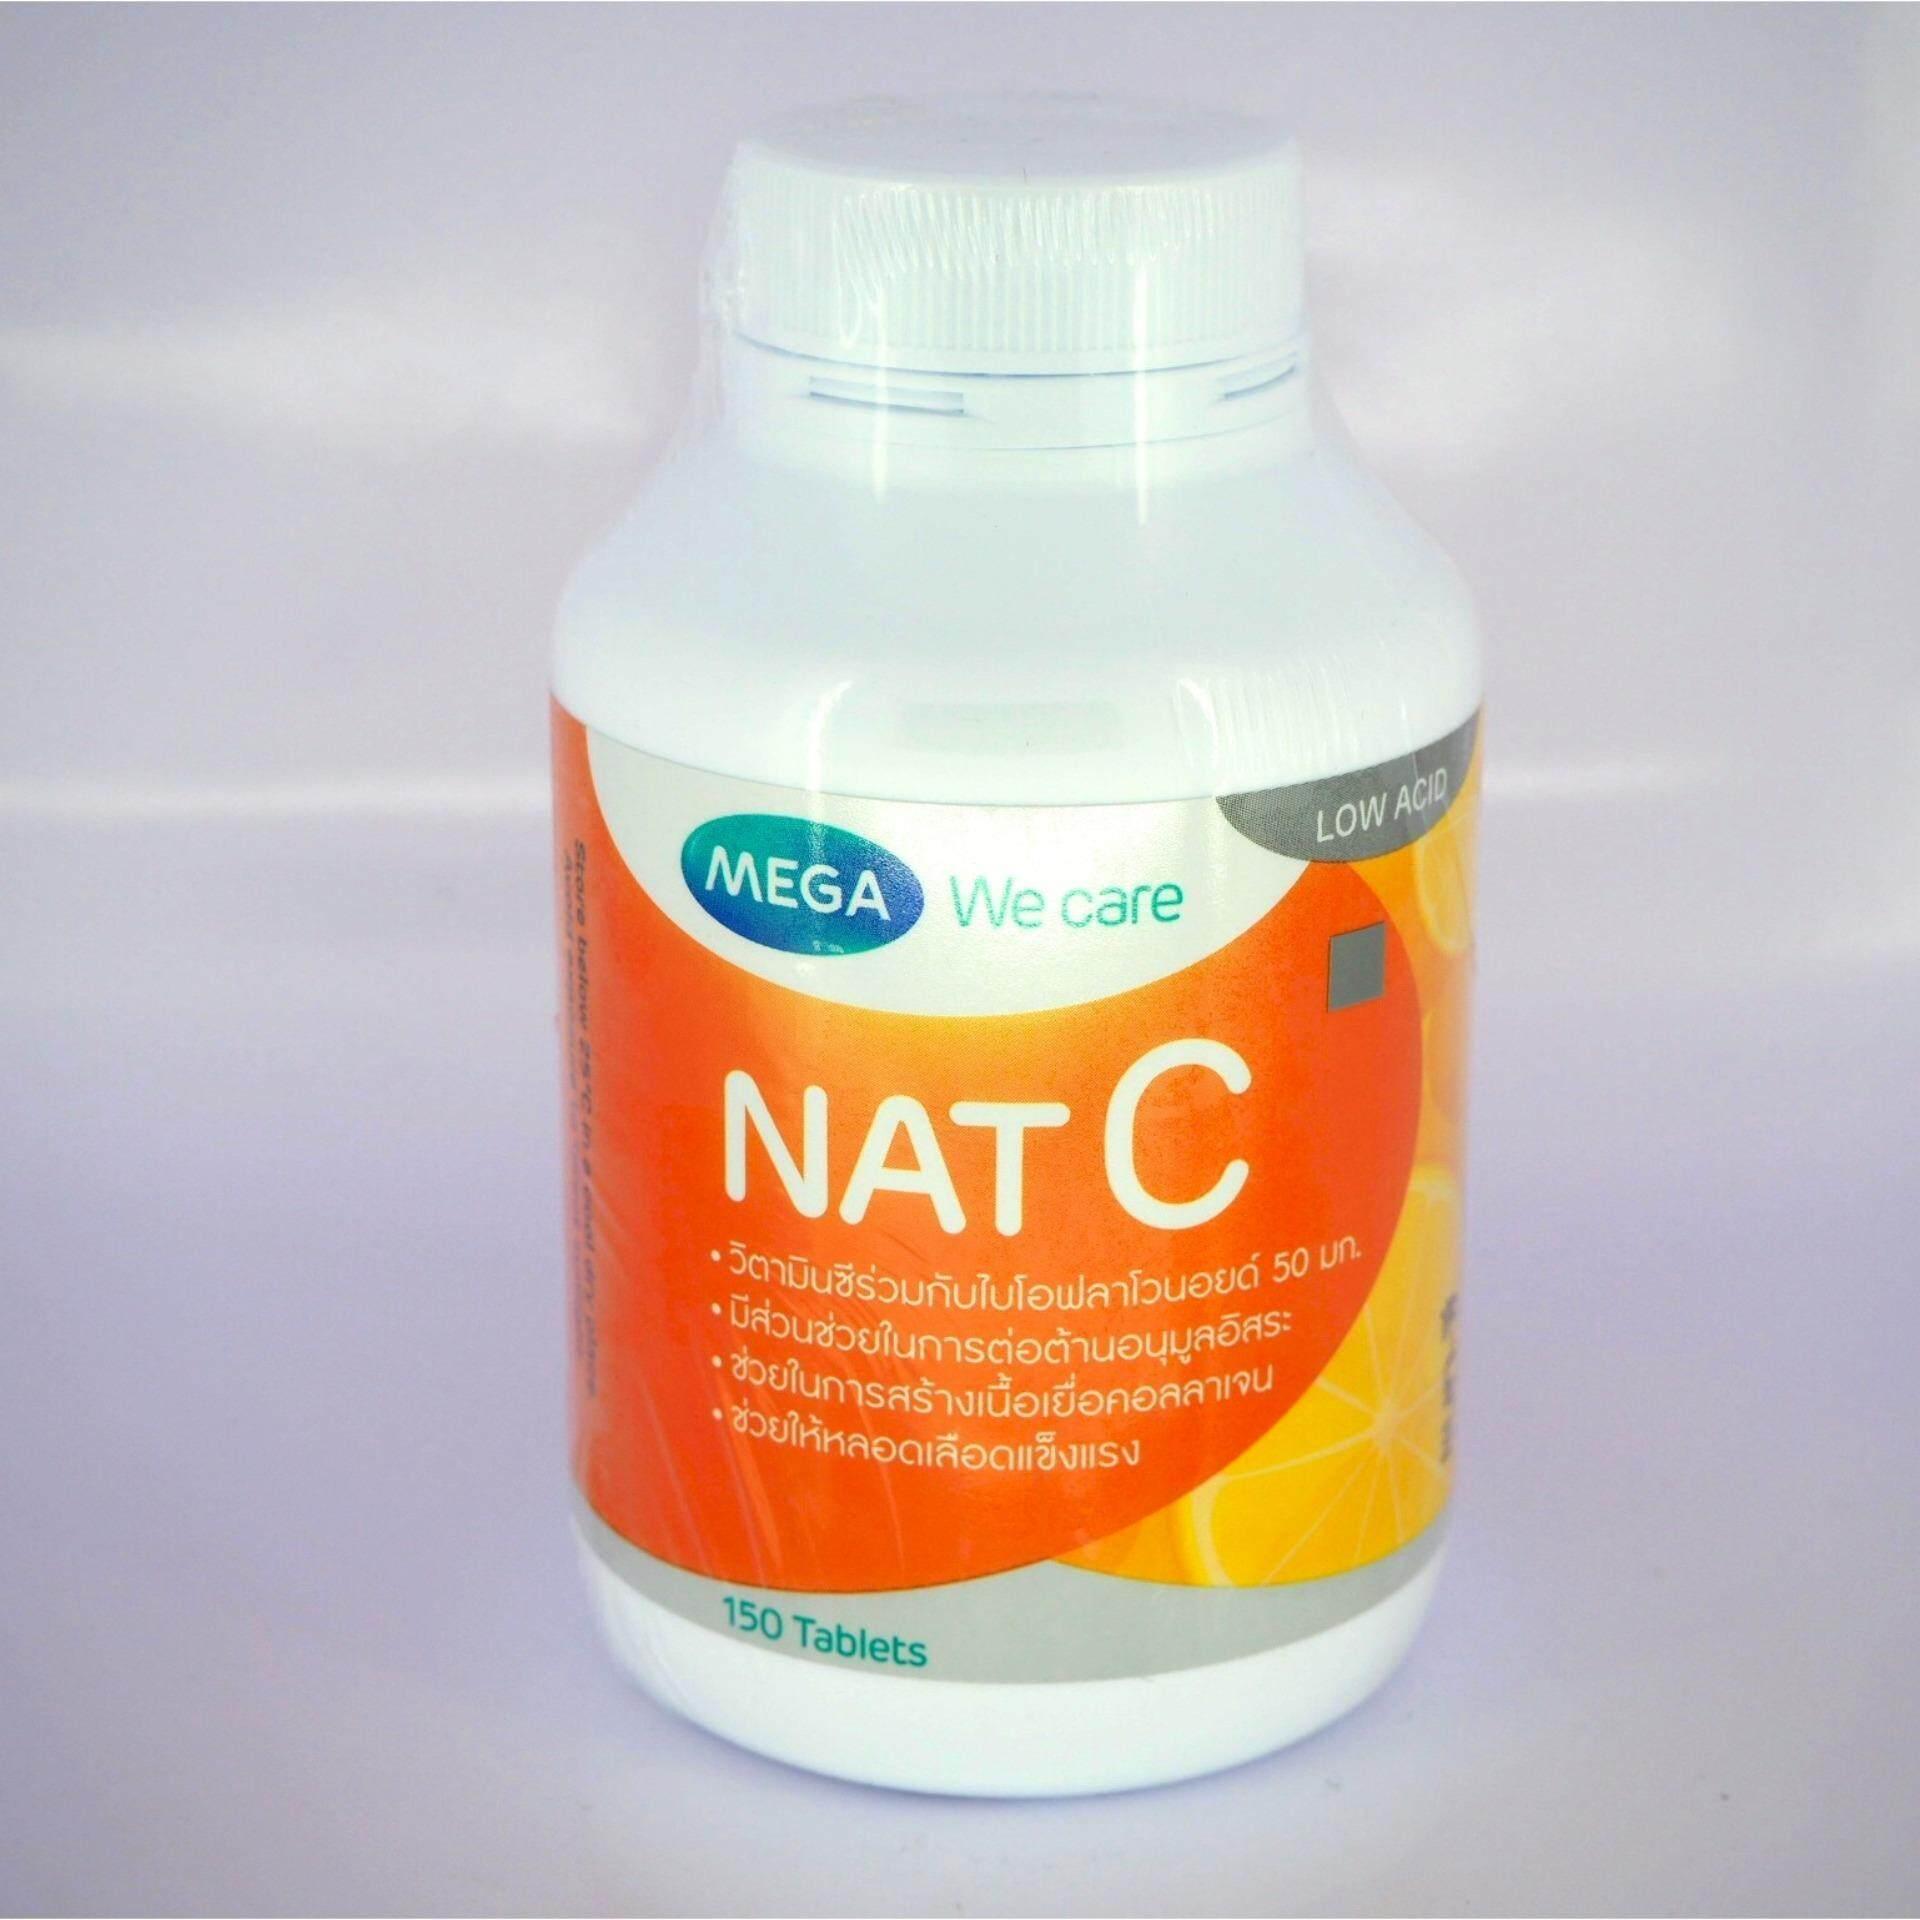 Mega We Care Nat C 150 เม็ด By Health Warehouse.